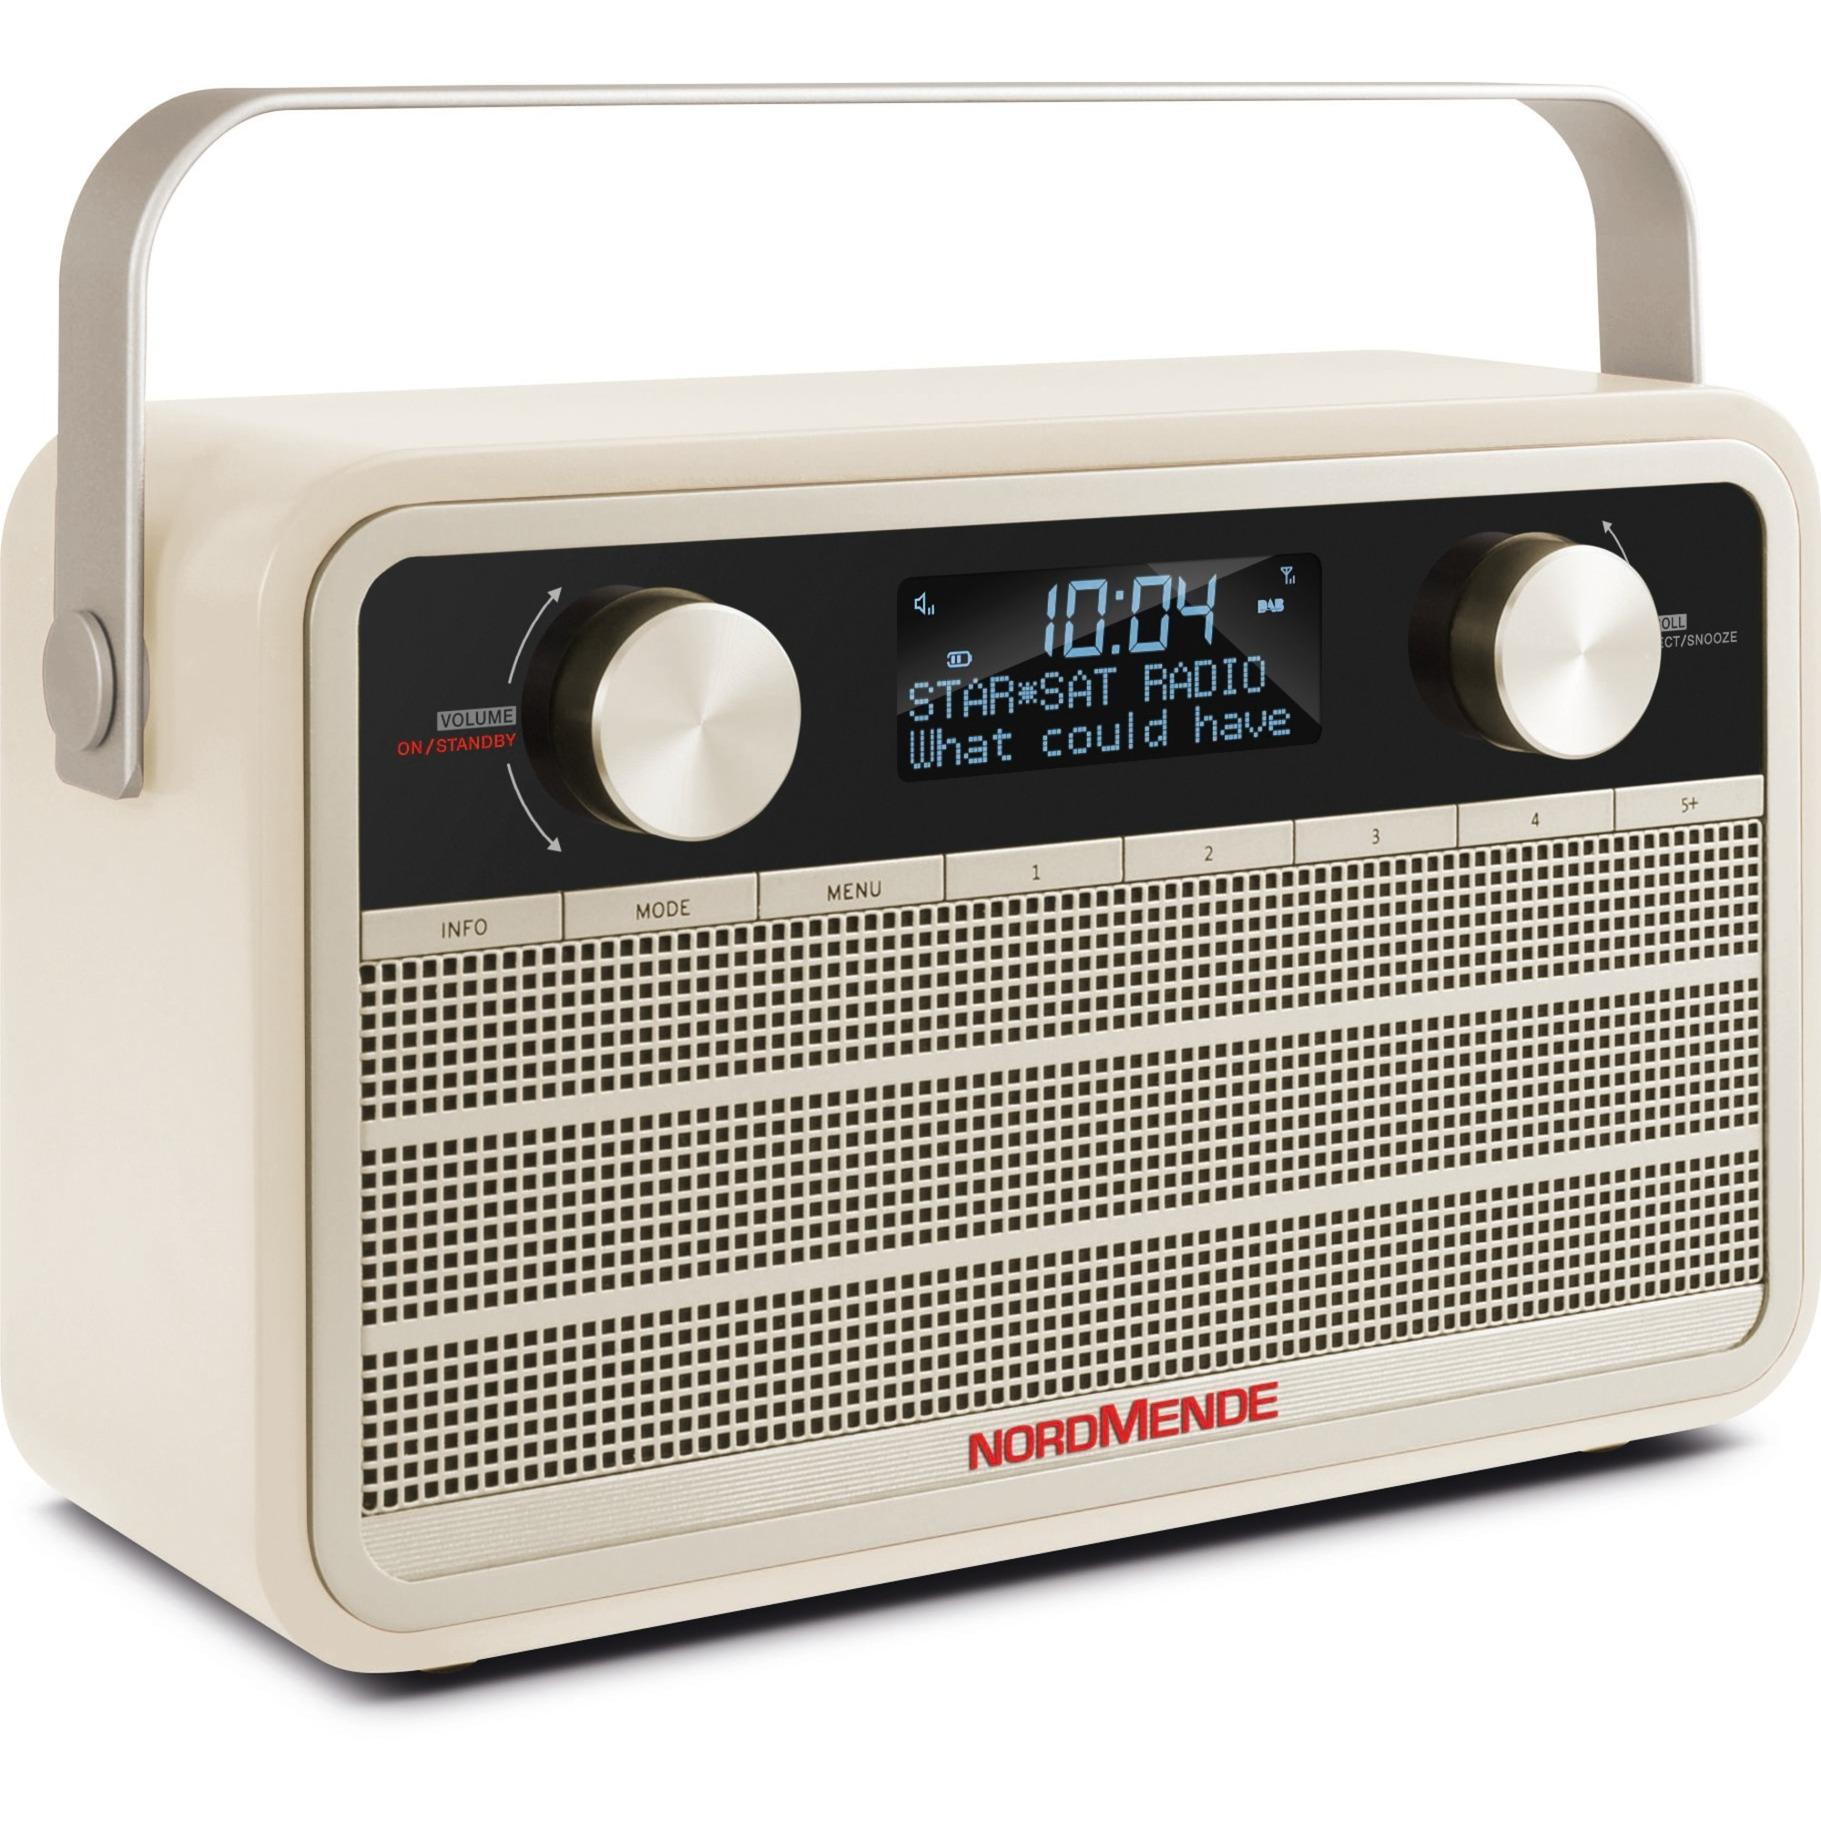 Transita 120 radio Portátil Digital Beige